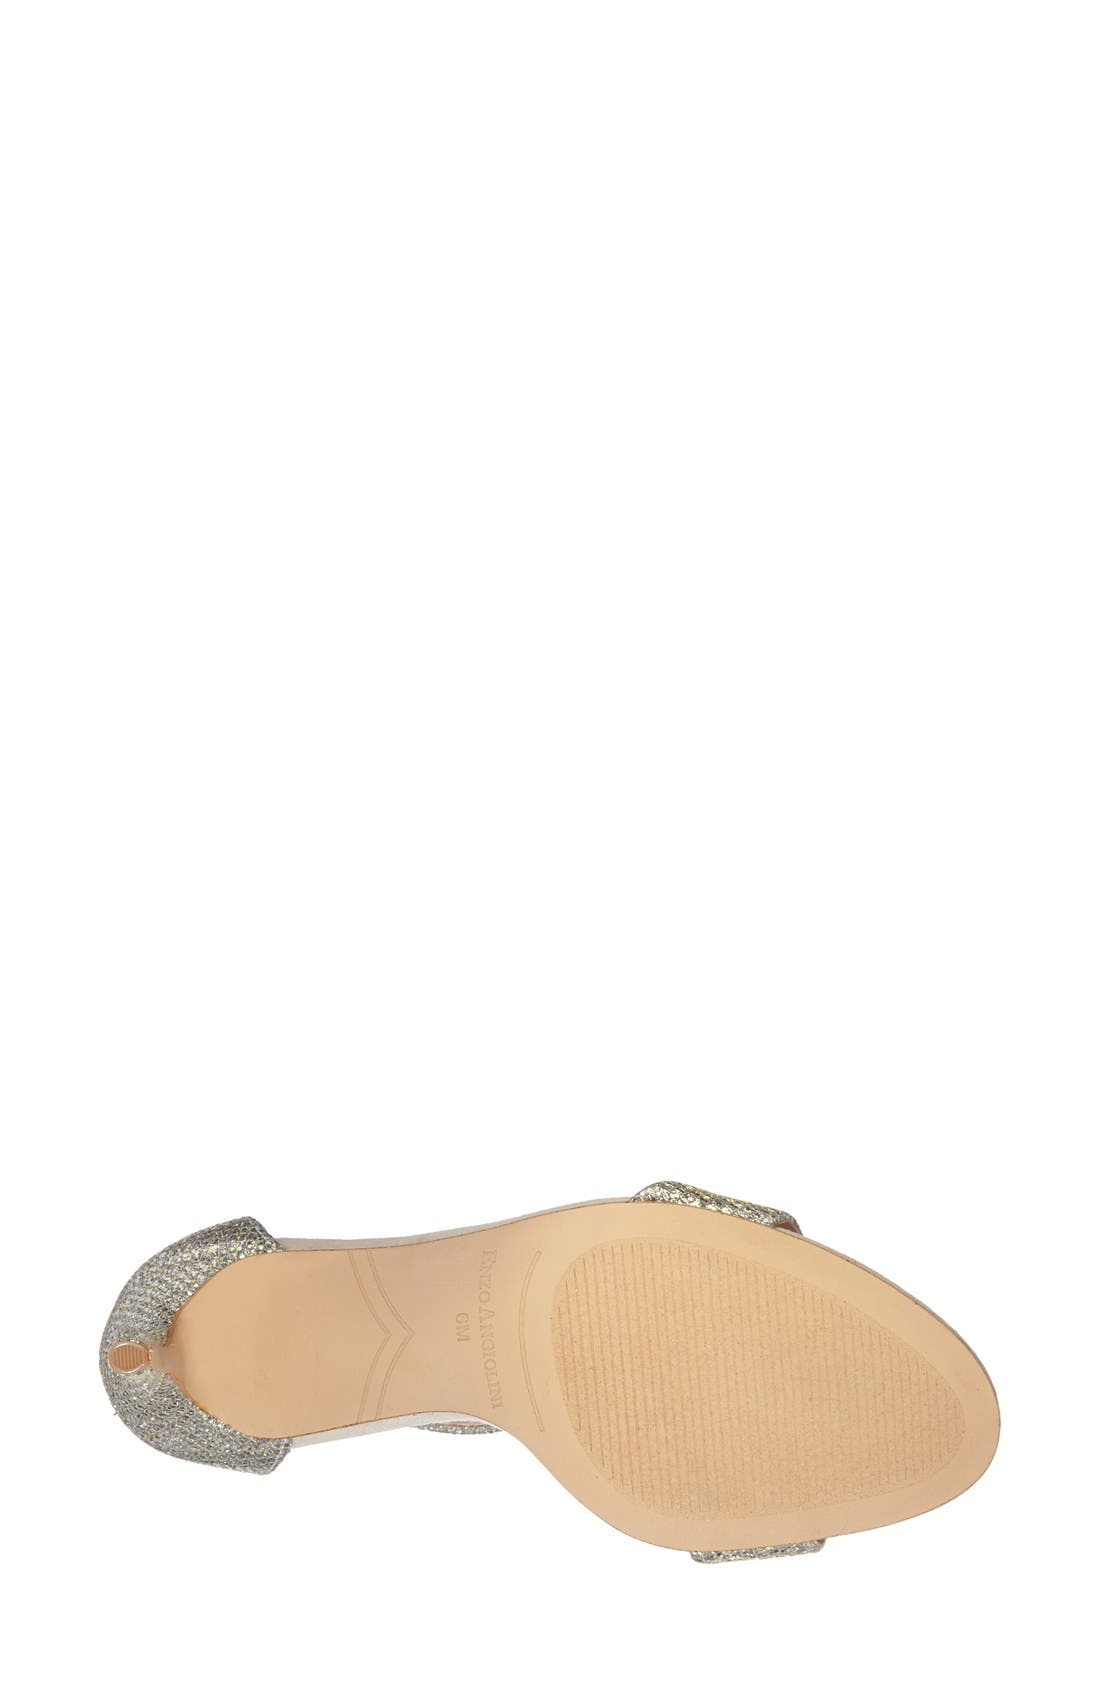 Alternate Image 4  - Enzo Angiolini 'Manna' Ankle Strap Sandal (Women)